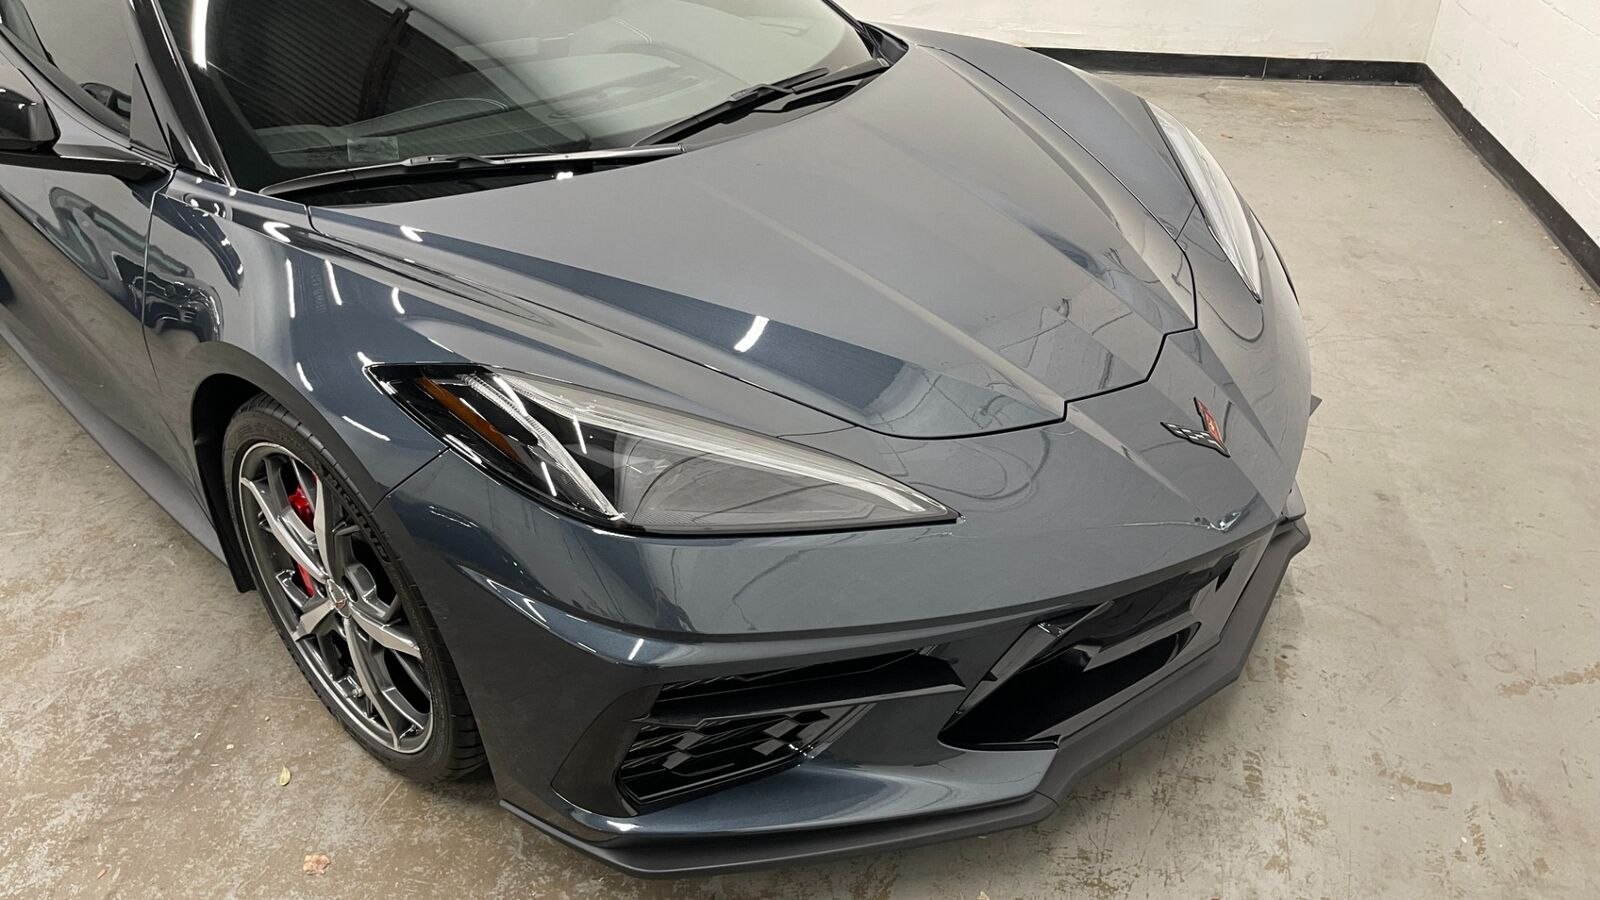 2020 Gray Chevrolet Corvette Stingray 1LT | C7 Corvette Photo 3